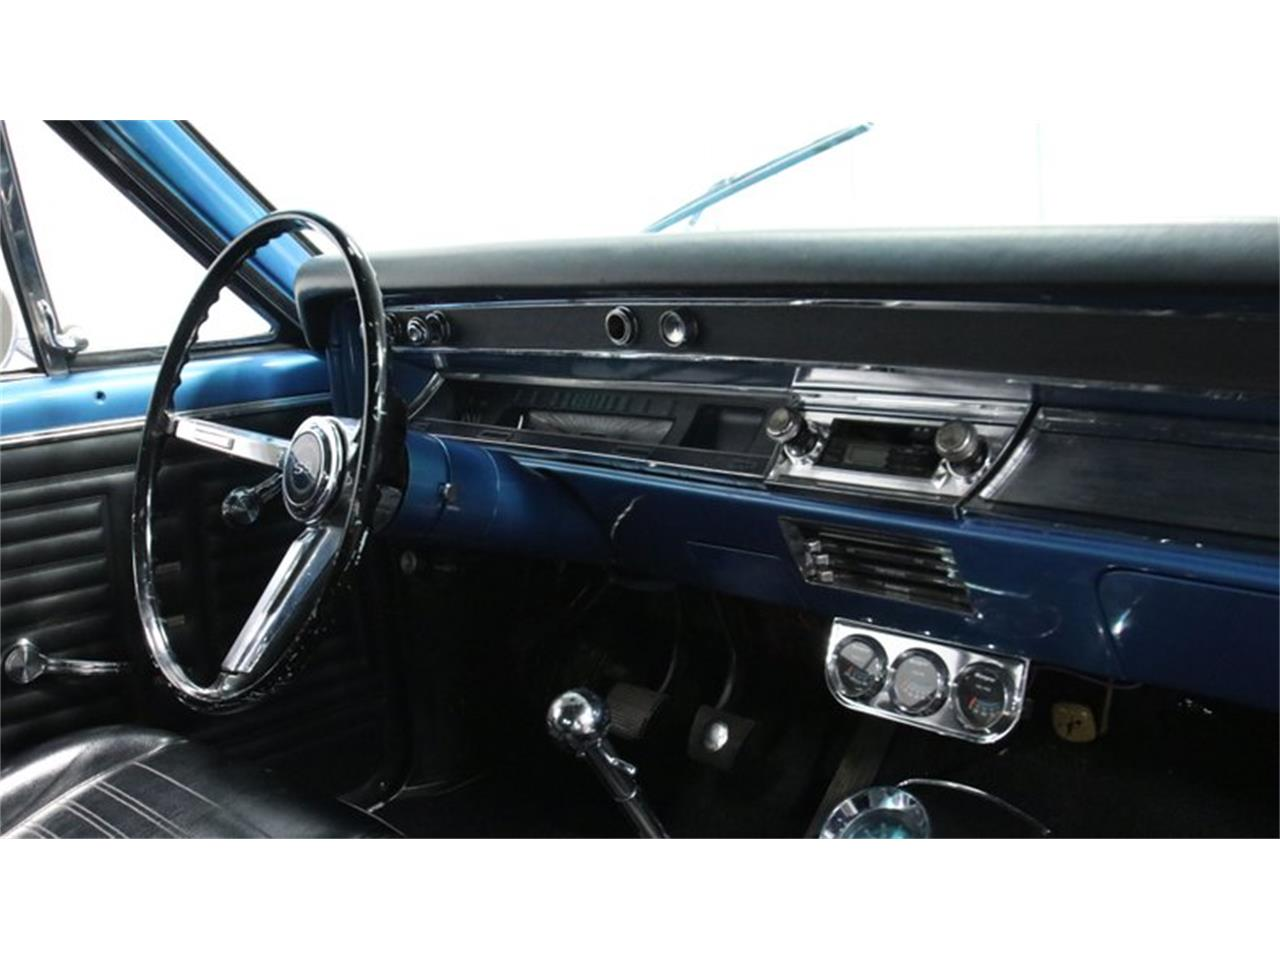 1967 Chevrolet Chevelle (CC-1390674) for sale in Lithia Springs, Georgia